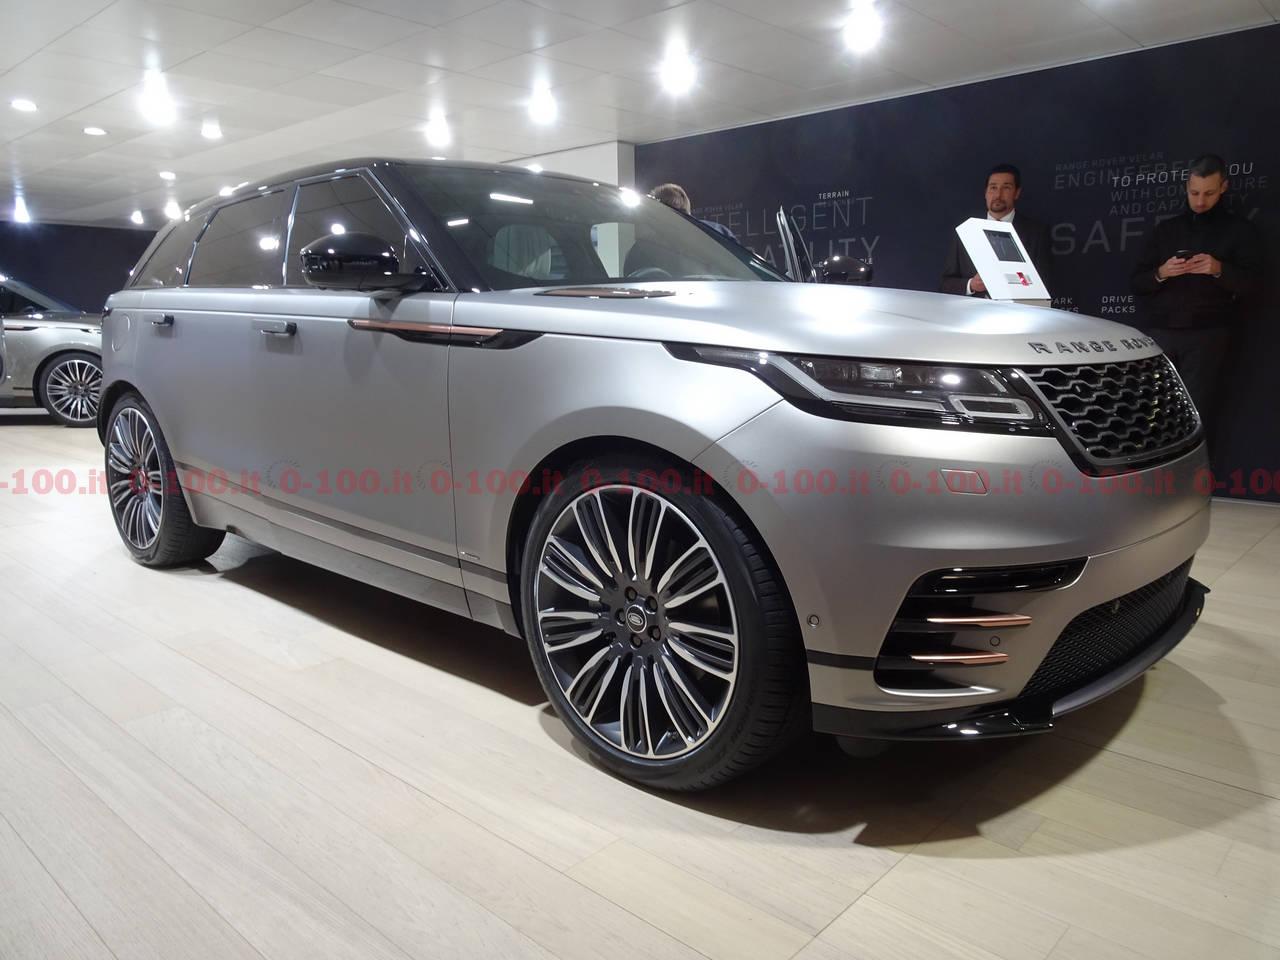 geneva-geneve-ginevra-2017-auto-show-range-rover-velar-0-100_7